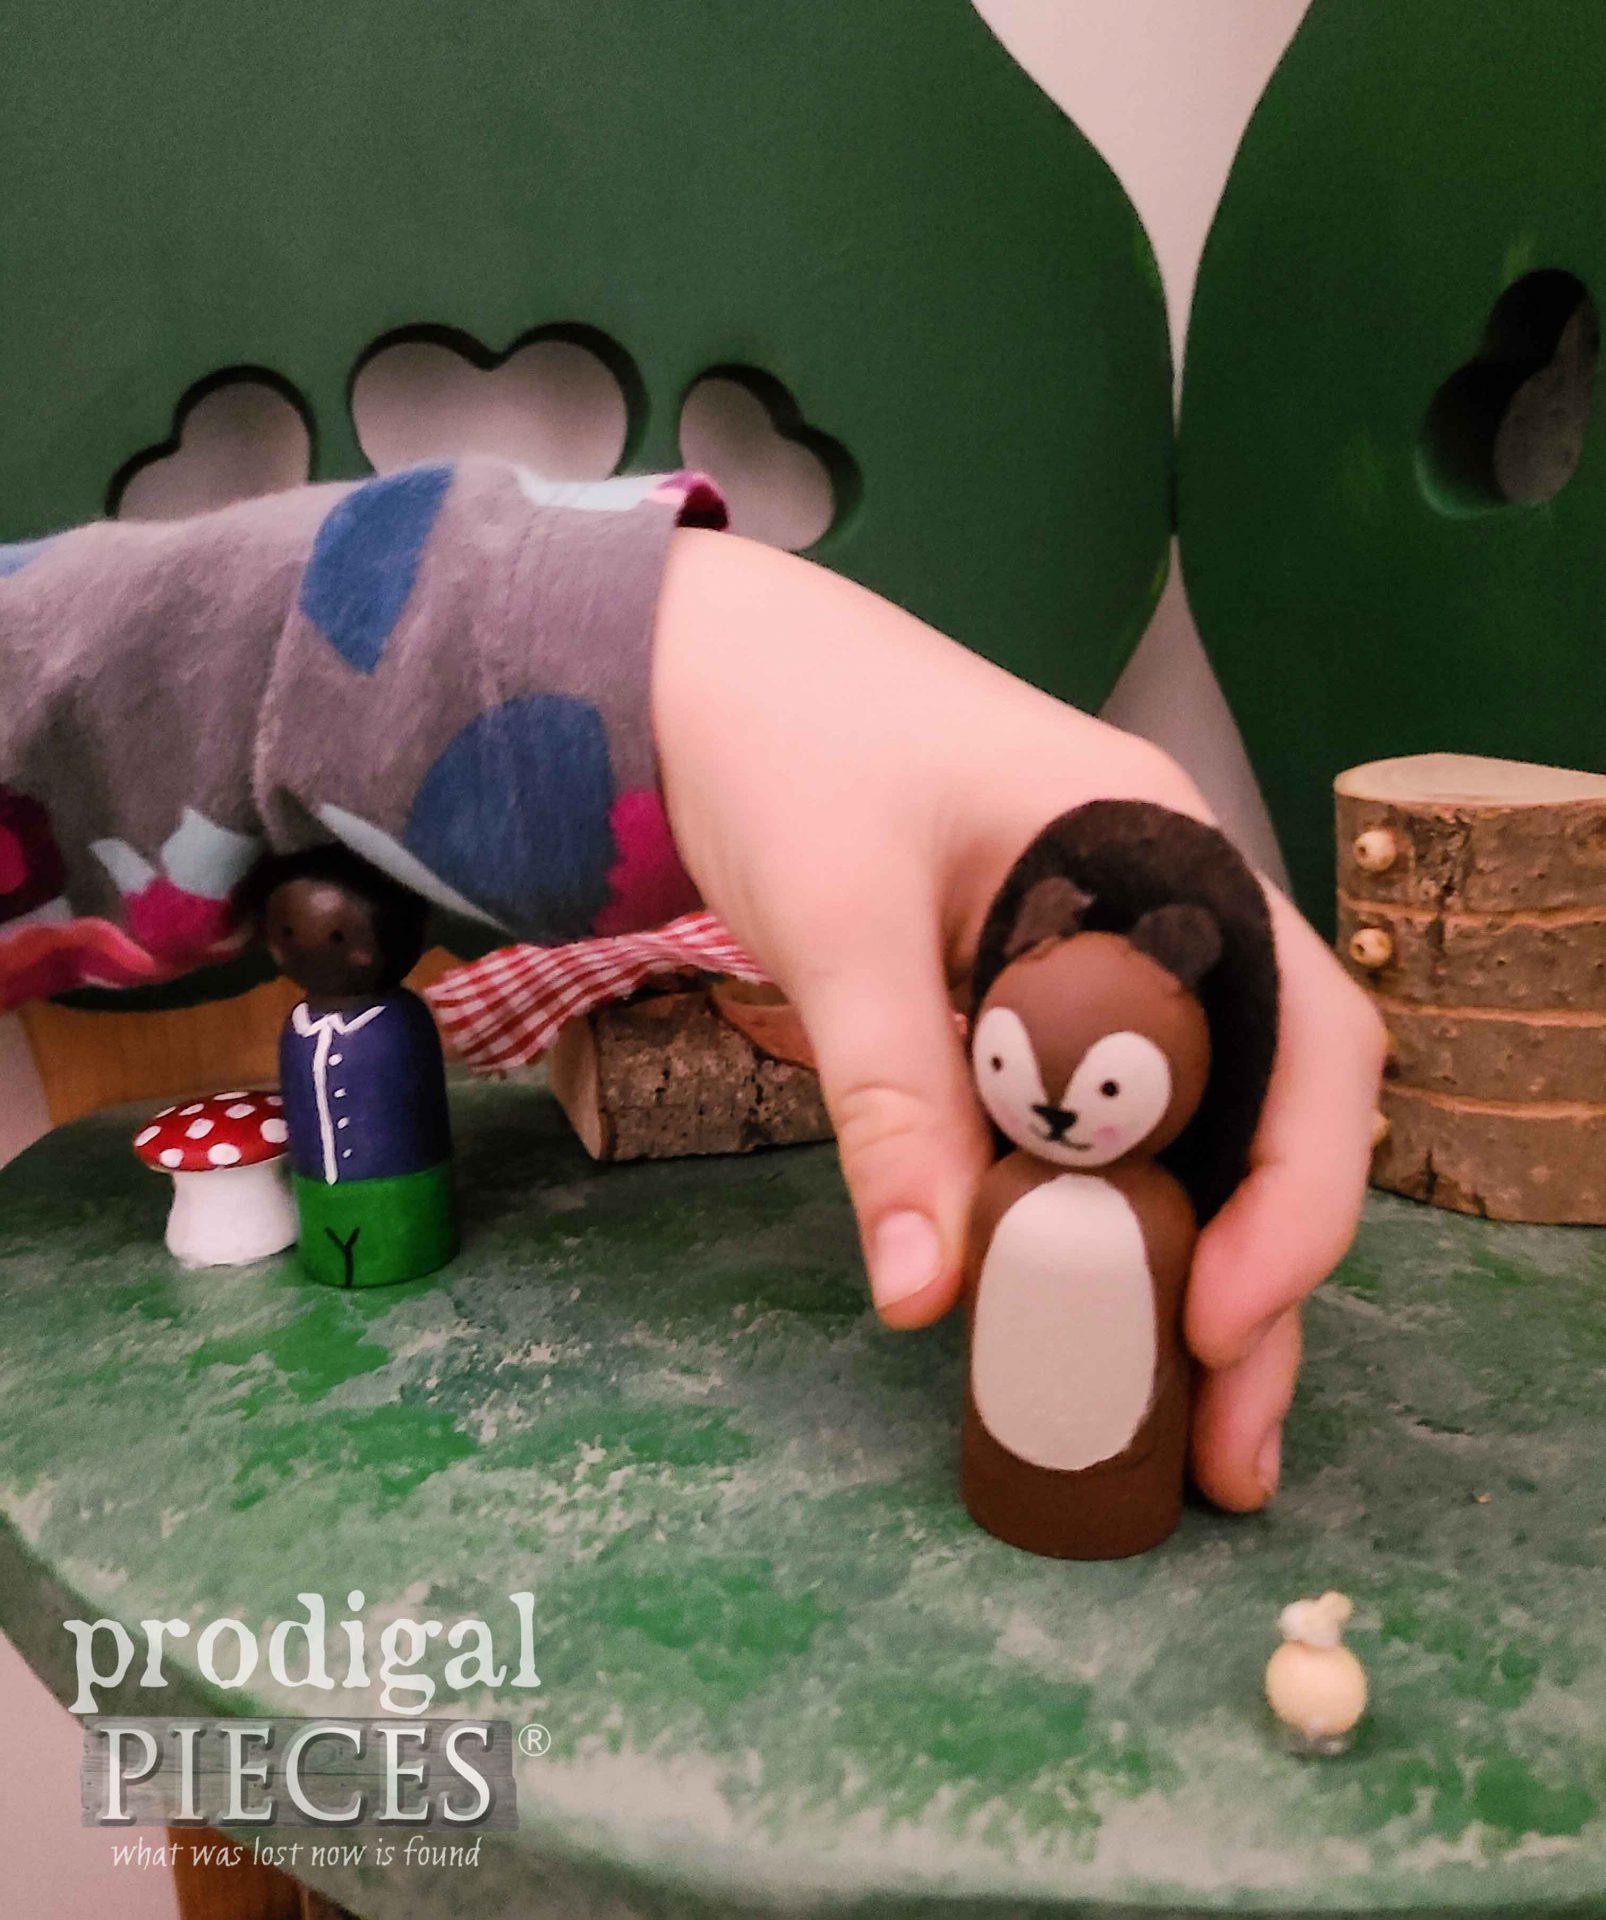 Woodland Squirrel Peg Doll Handmade by Larissa of Prodigal Pieces | prodigalpieces.com #prodigalpieces #handmade #kids #upcycled